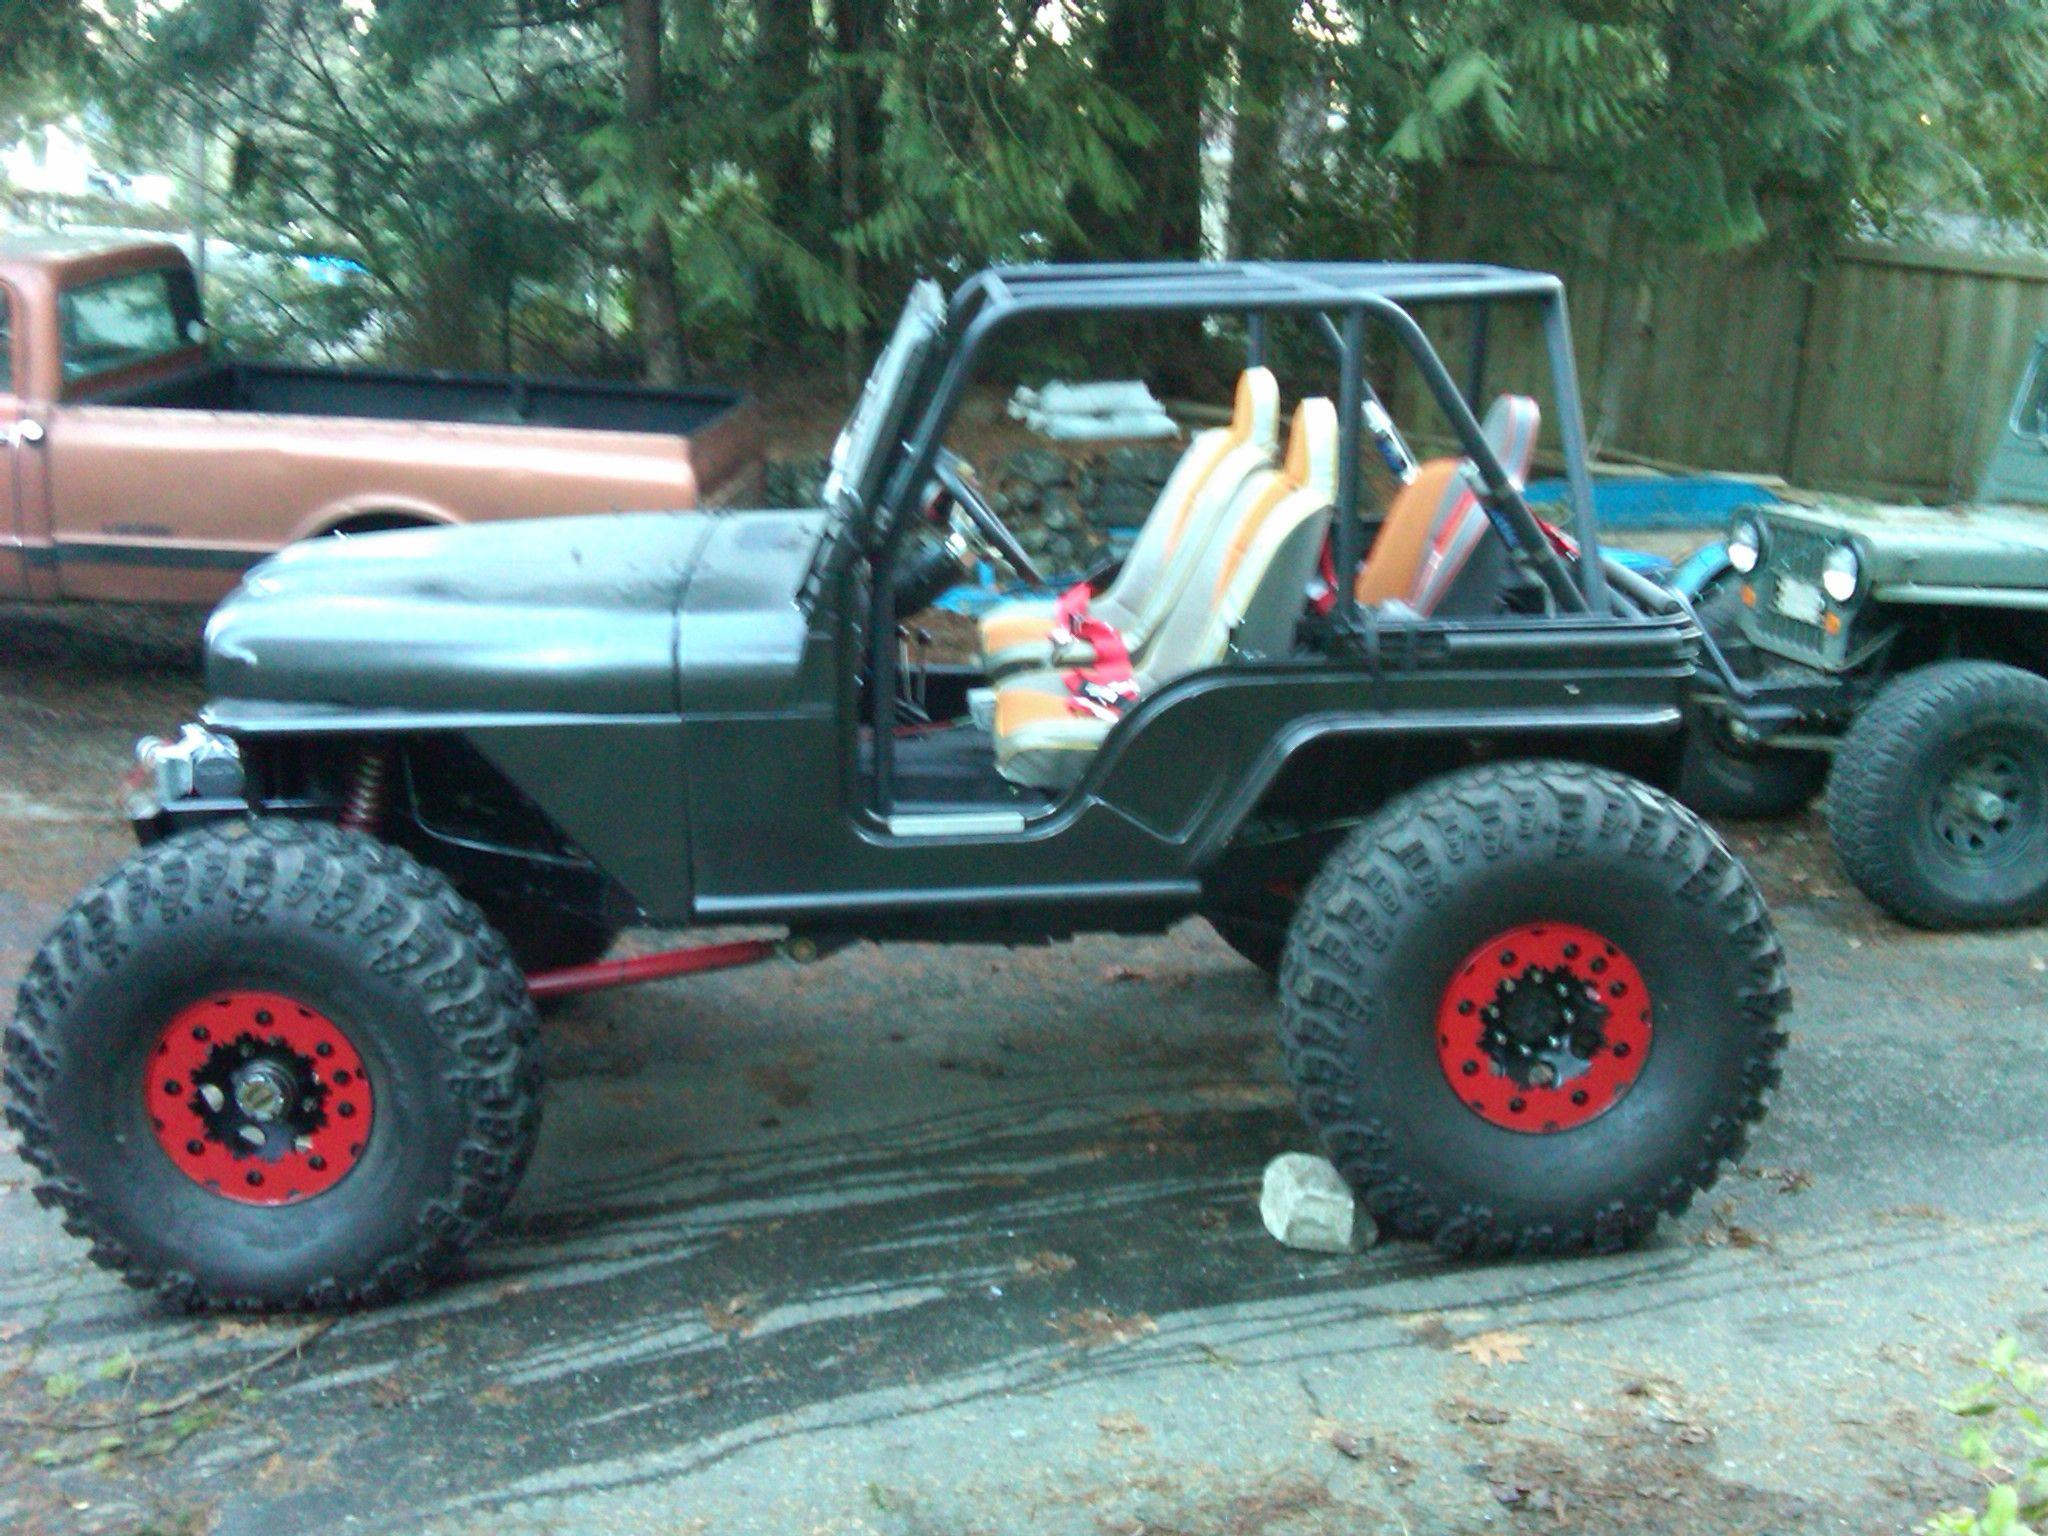 medium resolution of 1981 jeep cj5 100 wheelbase